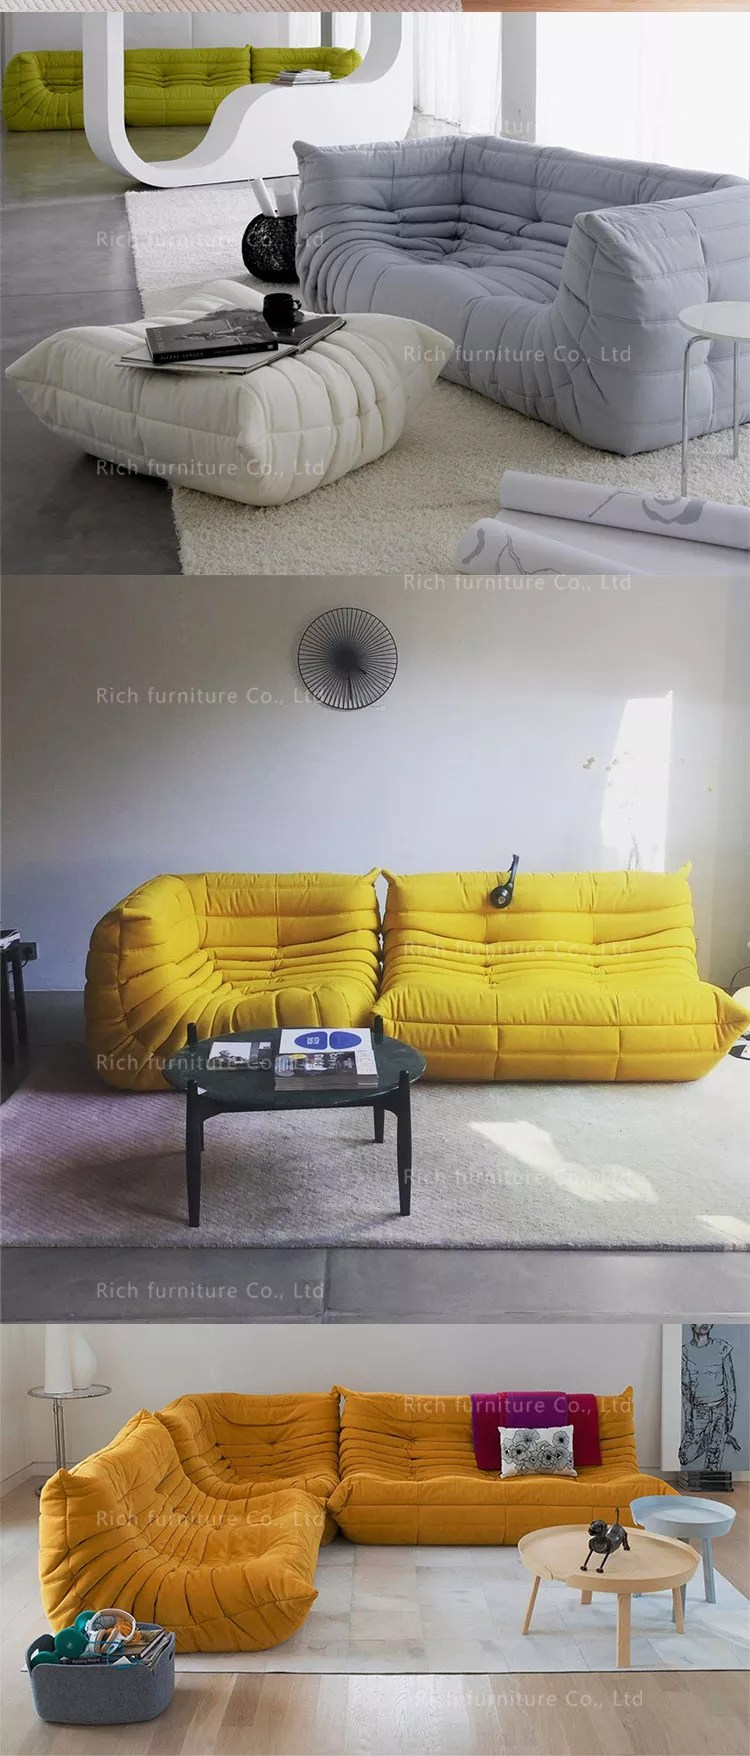 modern cotton linen floor sofa couch living room wholesale floor cushion seating sofa lounge lazy single person sofa buy floor sofa modern style